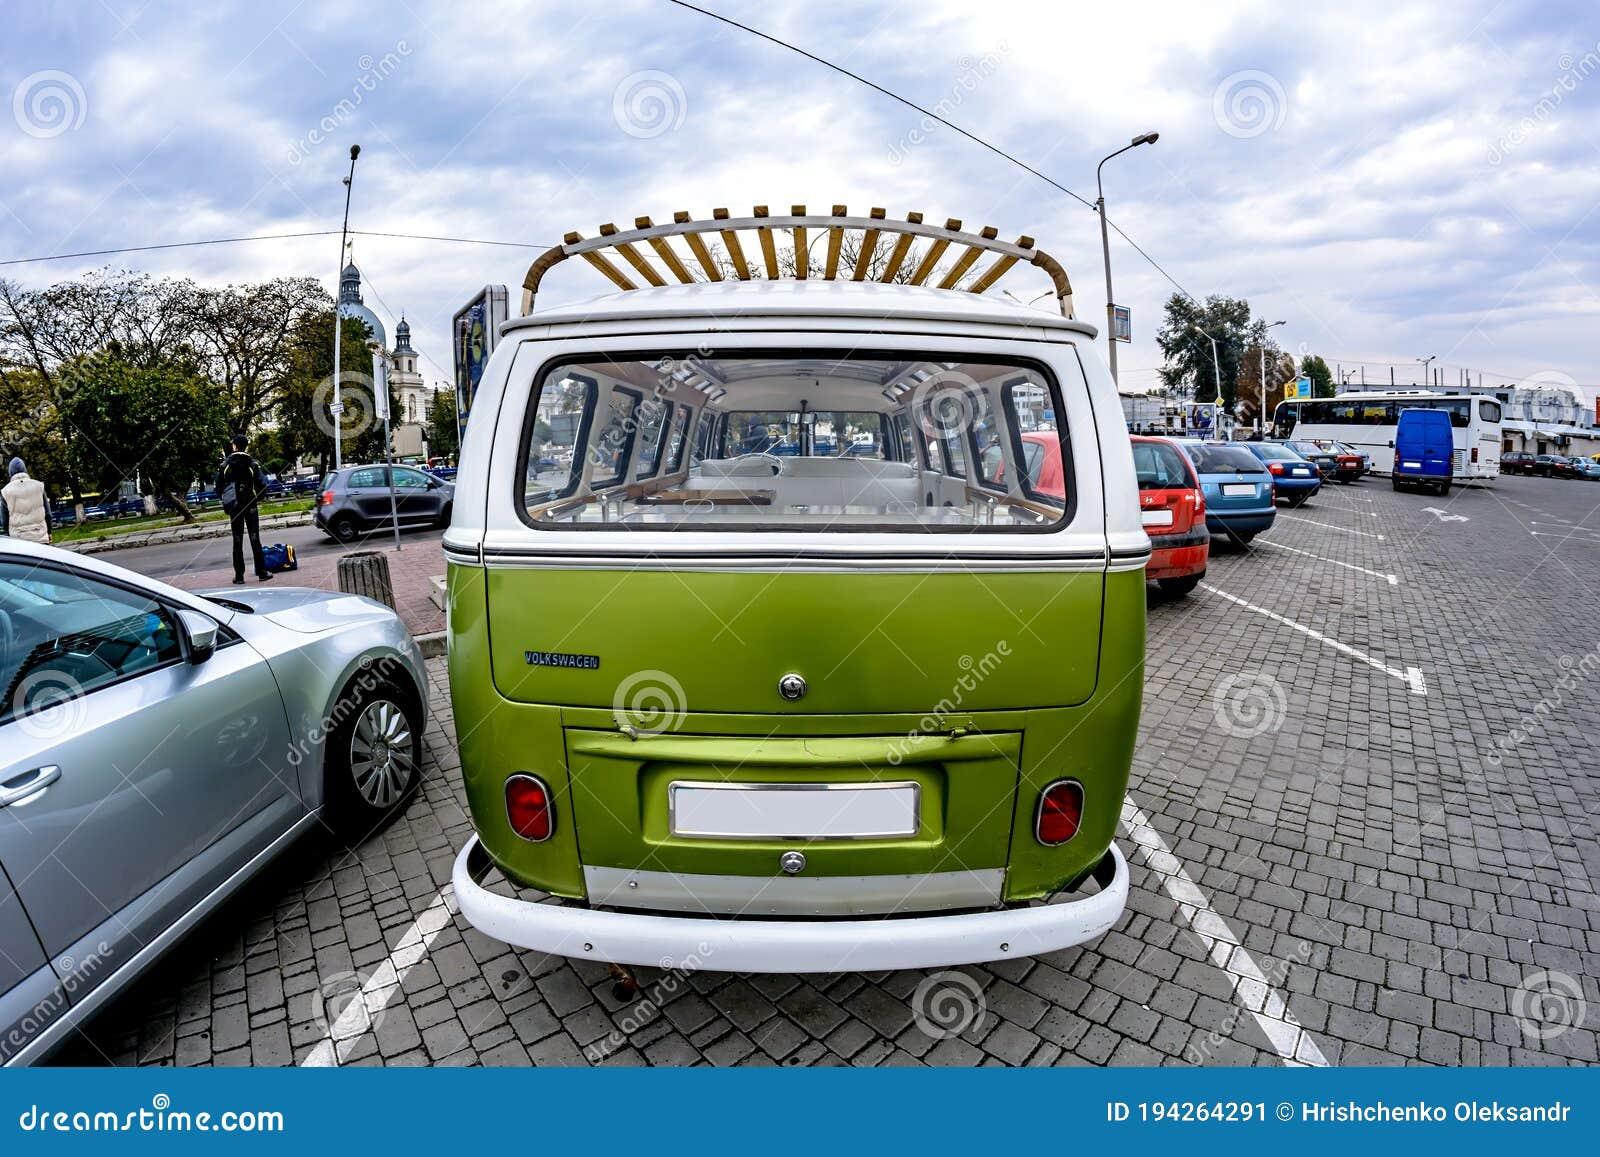 Ukraine Lviv 15 October 2015 German Classic Volkswagen Transporter Van In The Parking Lot Back View Editorial Photo Image Of Mini Minibus 194264291